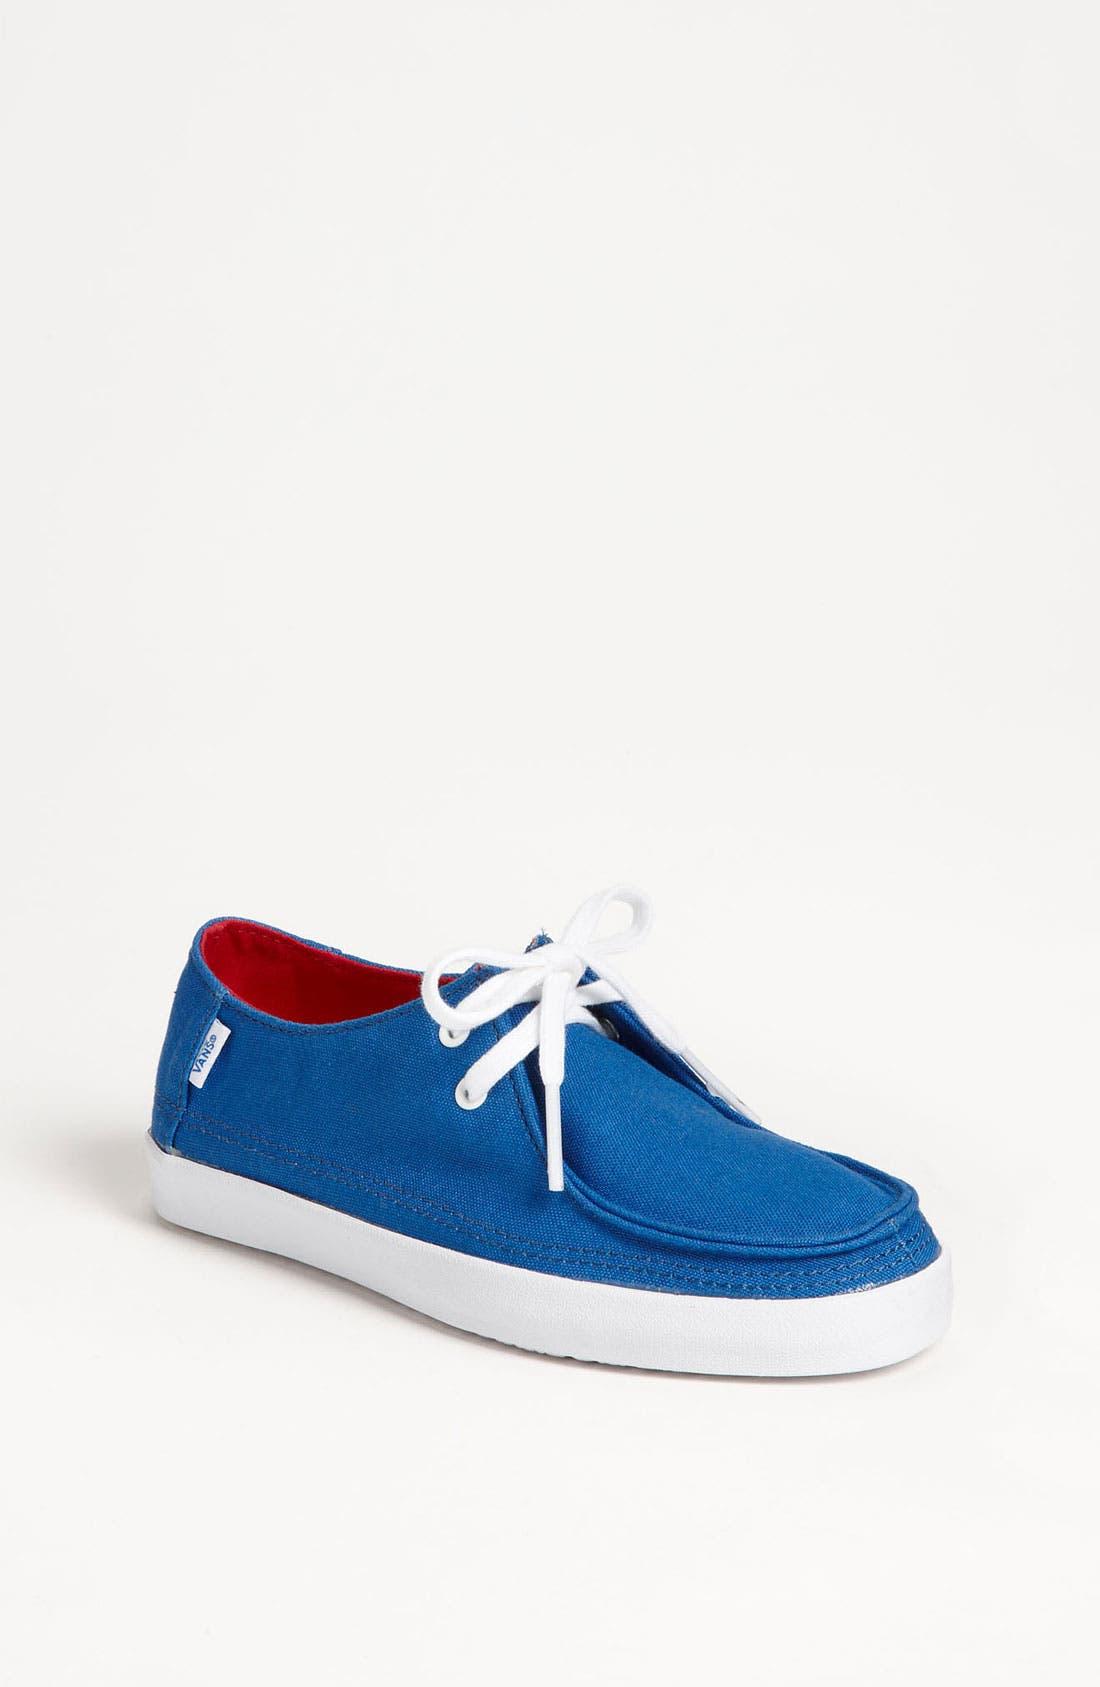 Main Image - Vans 'Rata' Sneaker (Toddler, Little Kid & Big Kid)